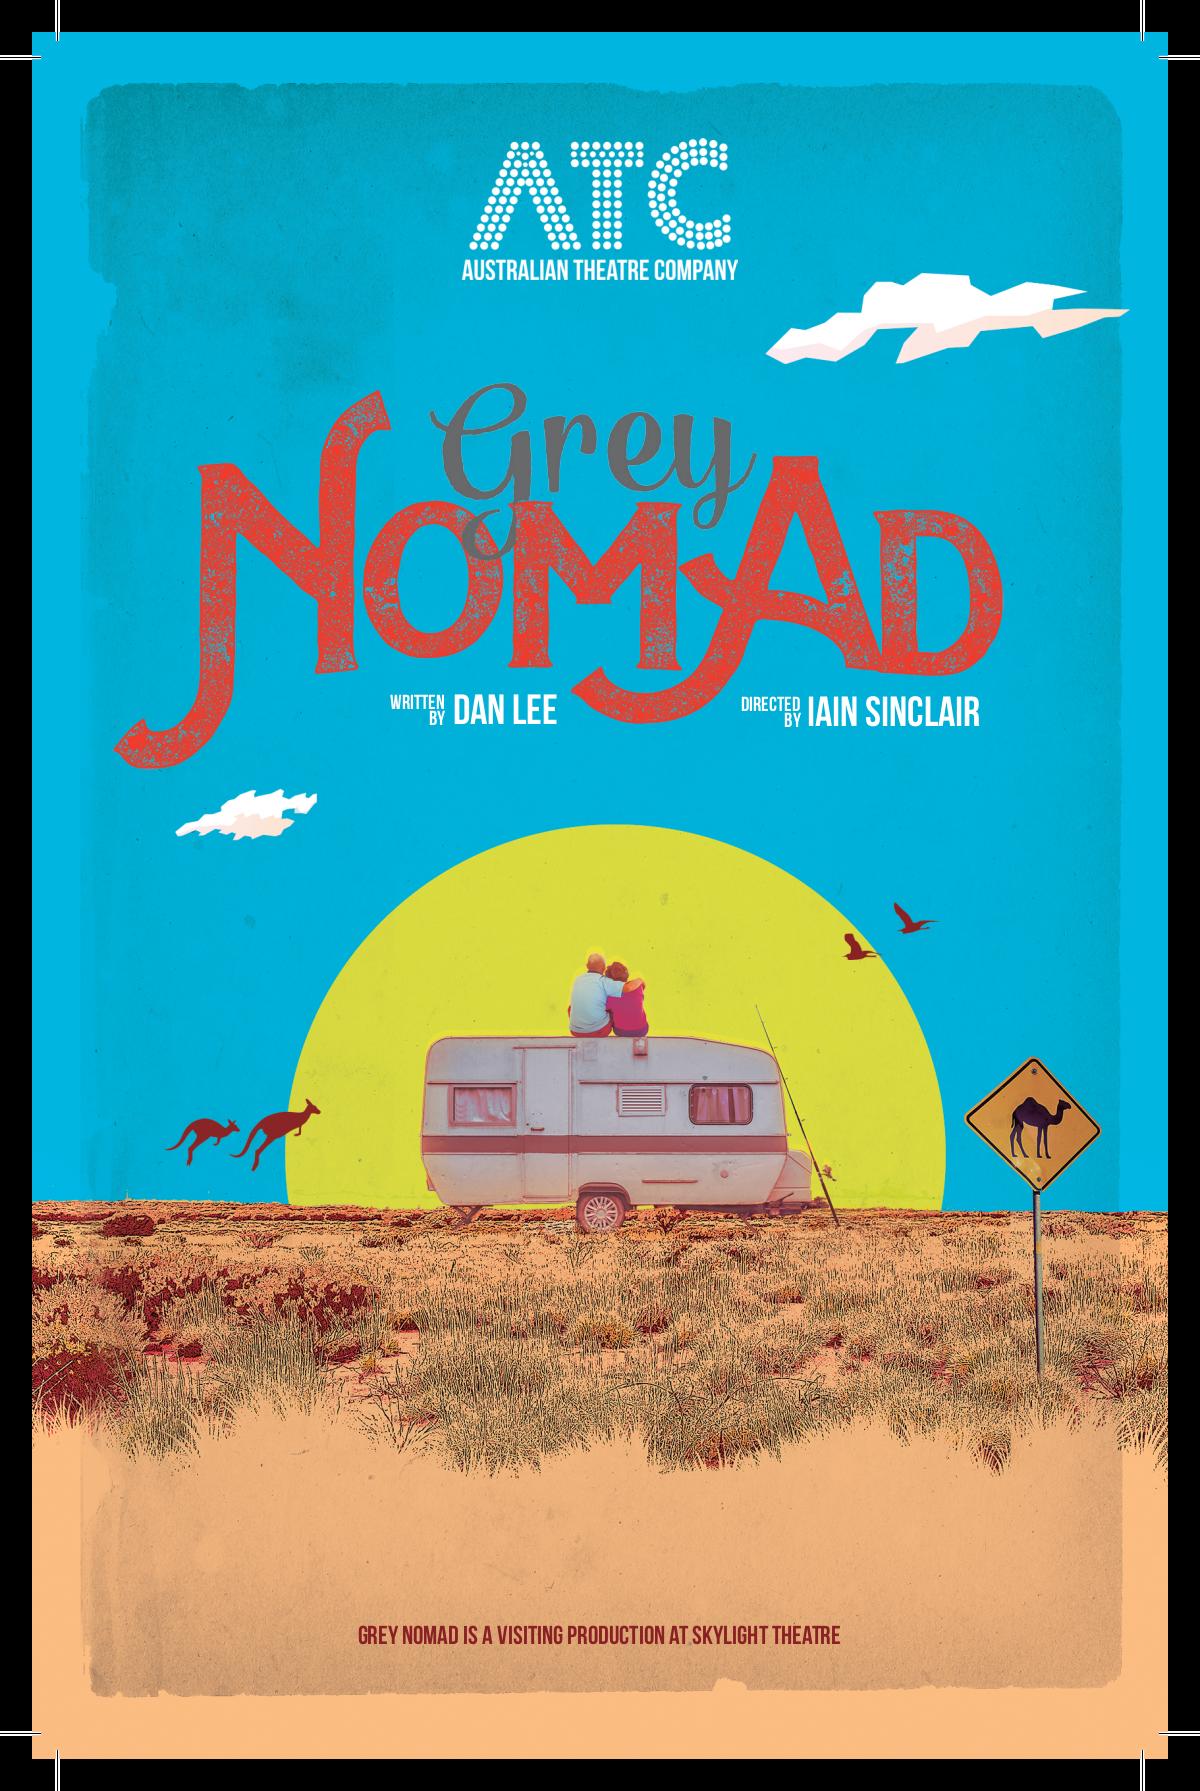 Grey Nomad show program